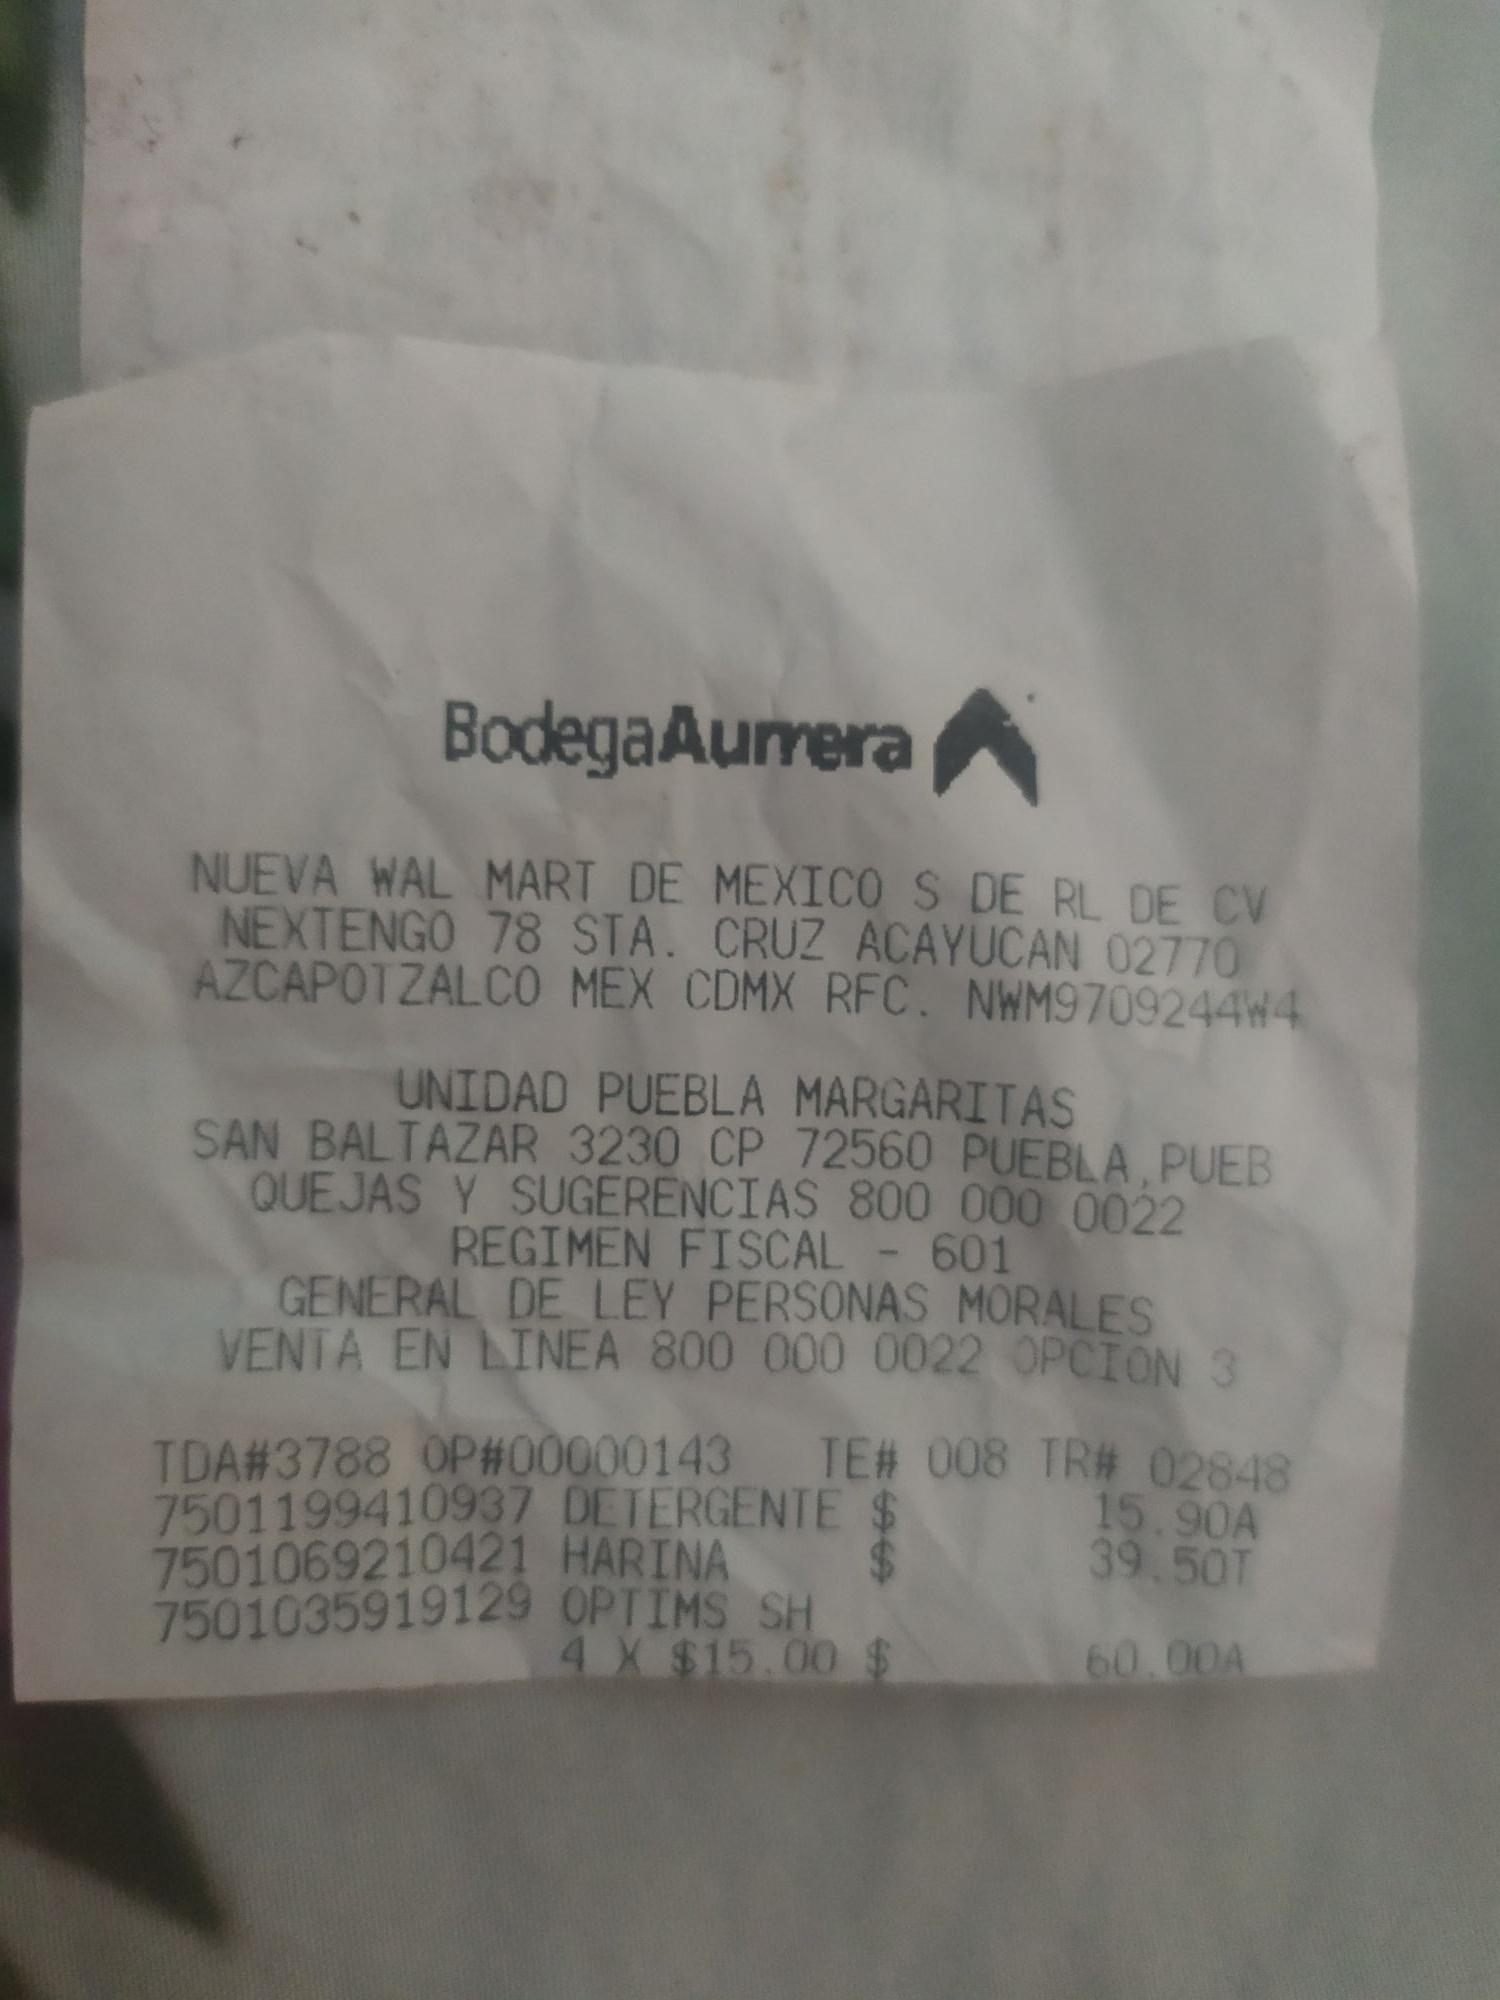 Bodega Aurrera: Shampoo Palmolive